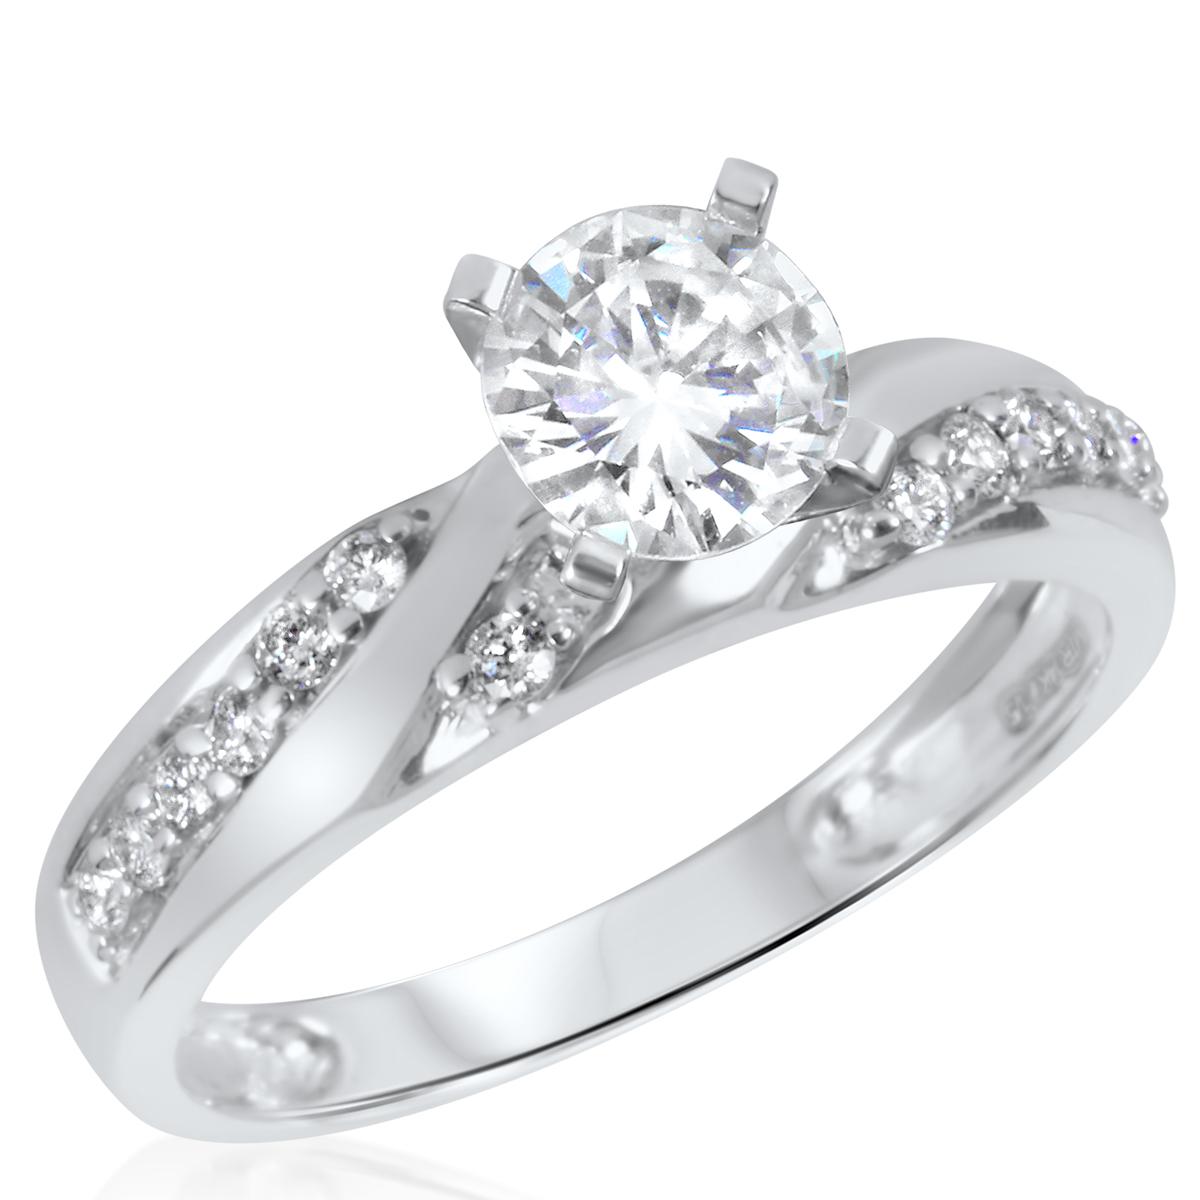 1 CT. T.W. Diamond Ladies Engagement Ring 10K White Gold- Size 8